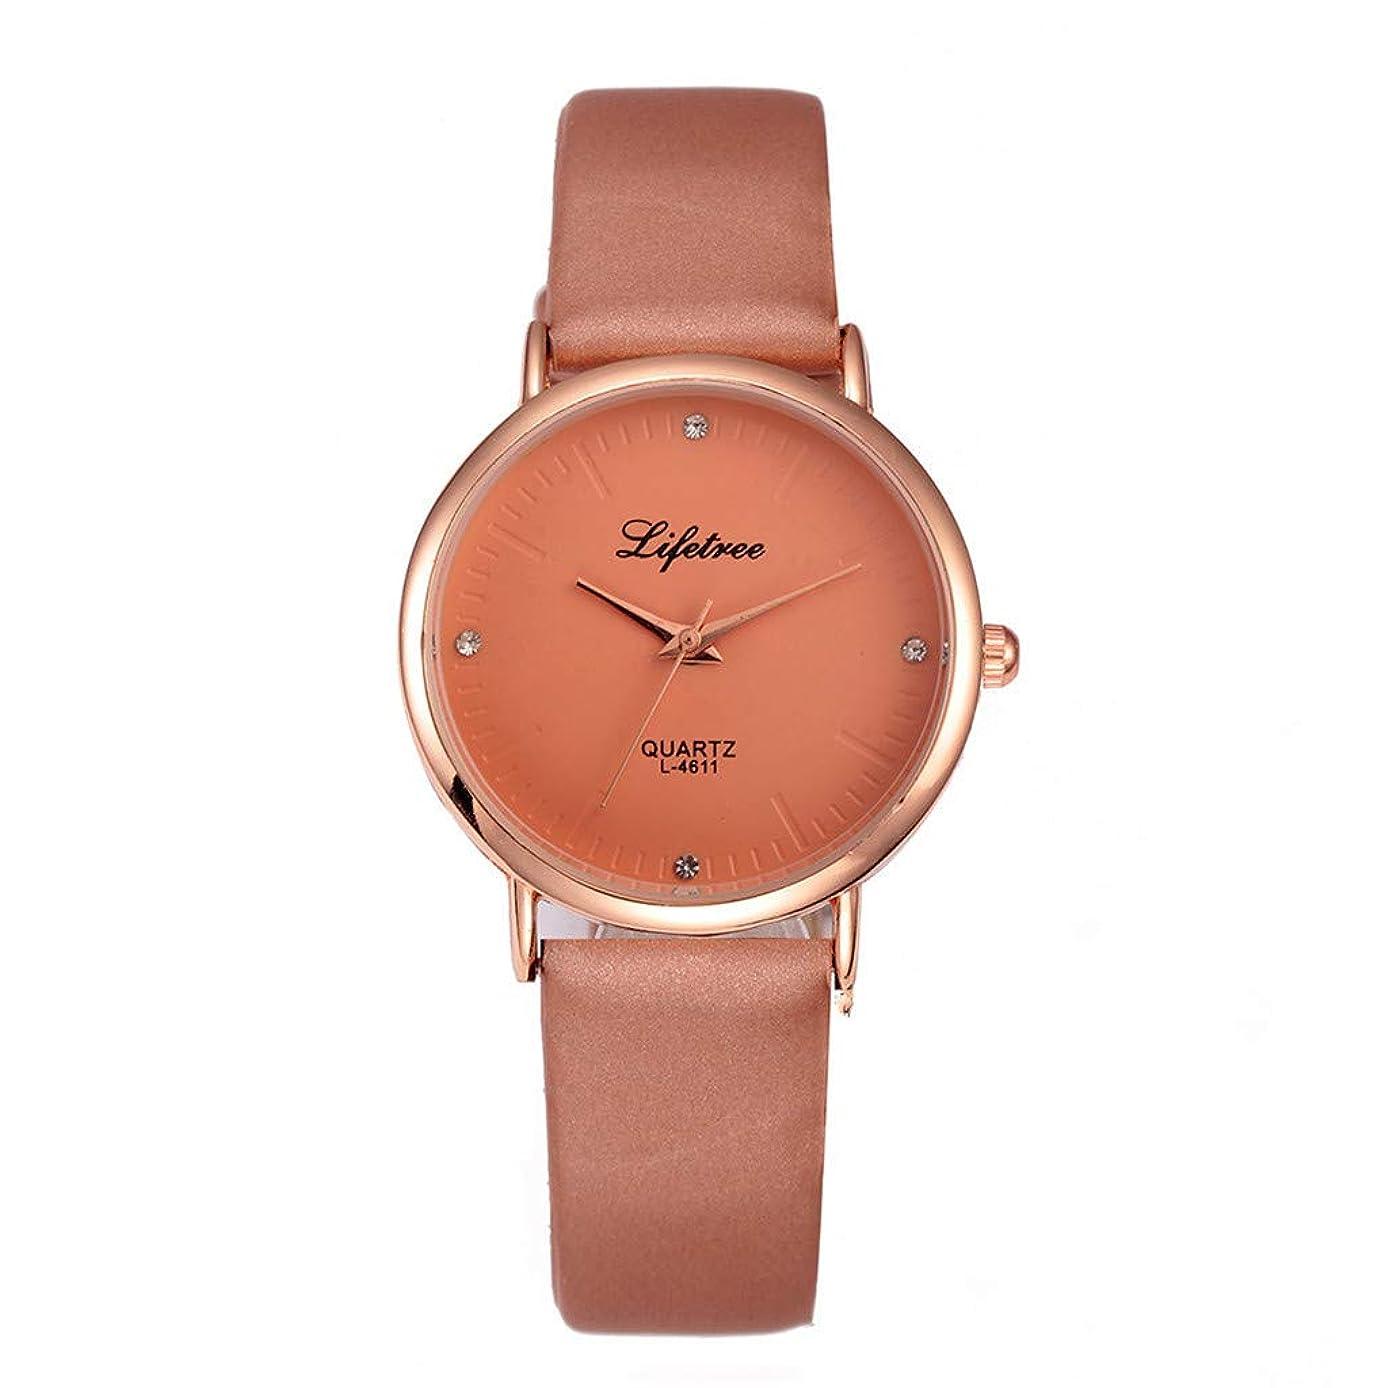 Mitsutomi Japanese Quartz Watch,Timezone Quartz Watches,Red Sport Watch,Mechanical Watch Case,Boys Chain Watch,Leather Bracelet Watch,Digital Watches Women